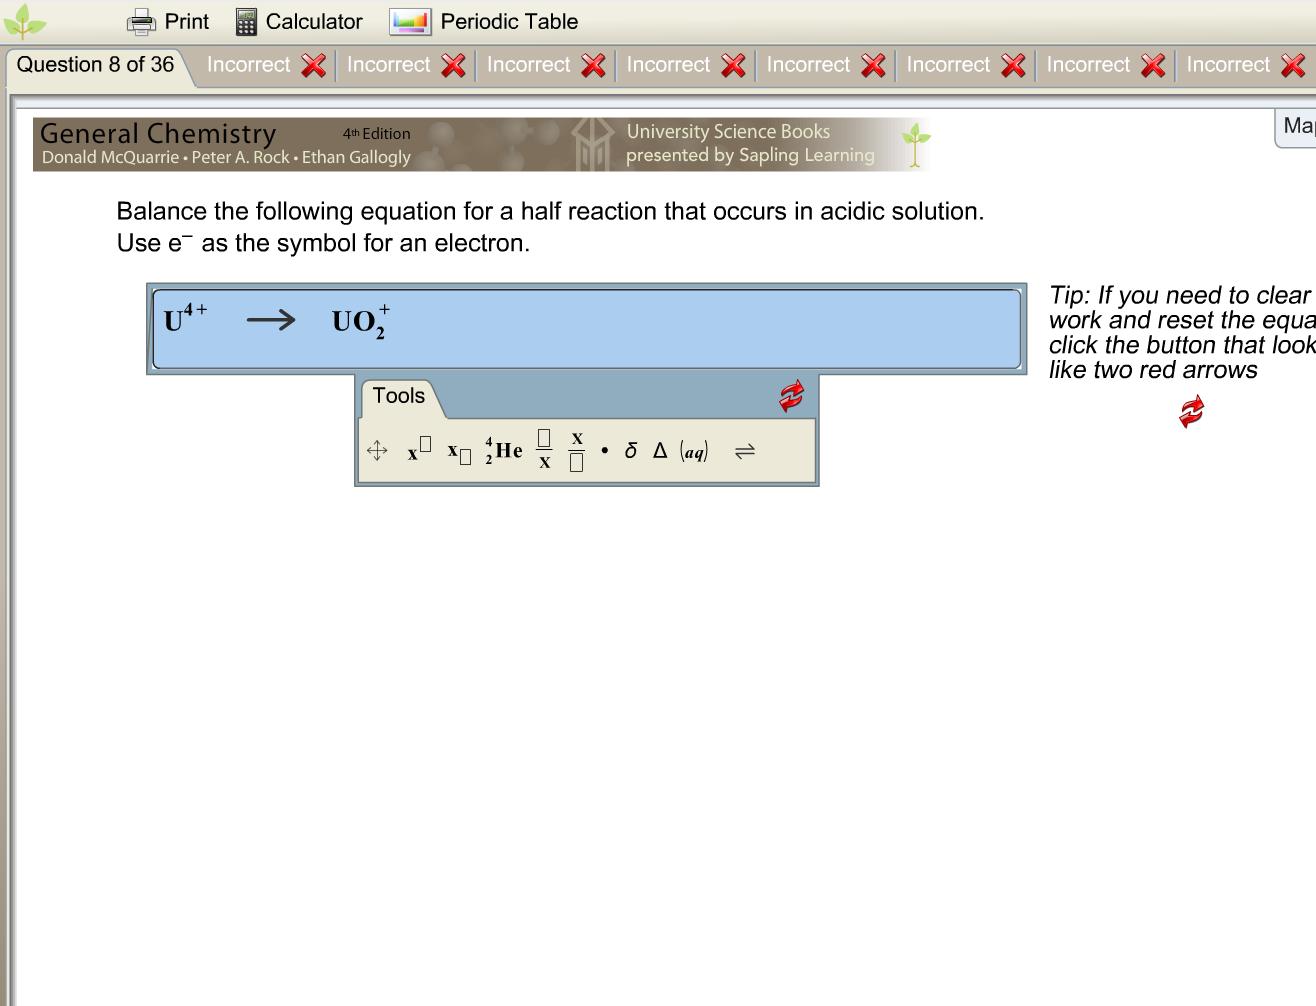 Print calculator l periodic table incorrect x inco chegg print calculator l periodic table incorrect x inco buycottarizona Images